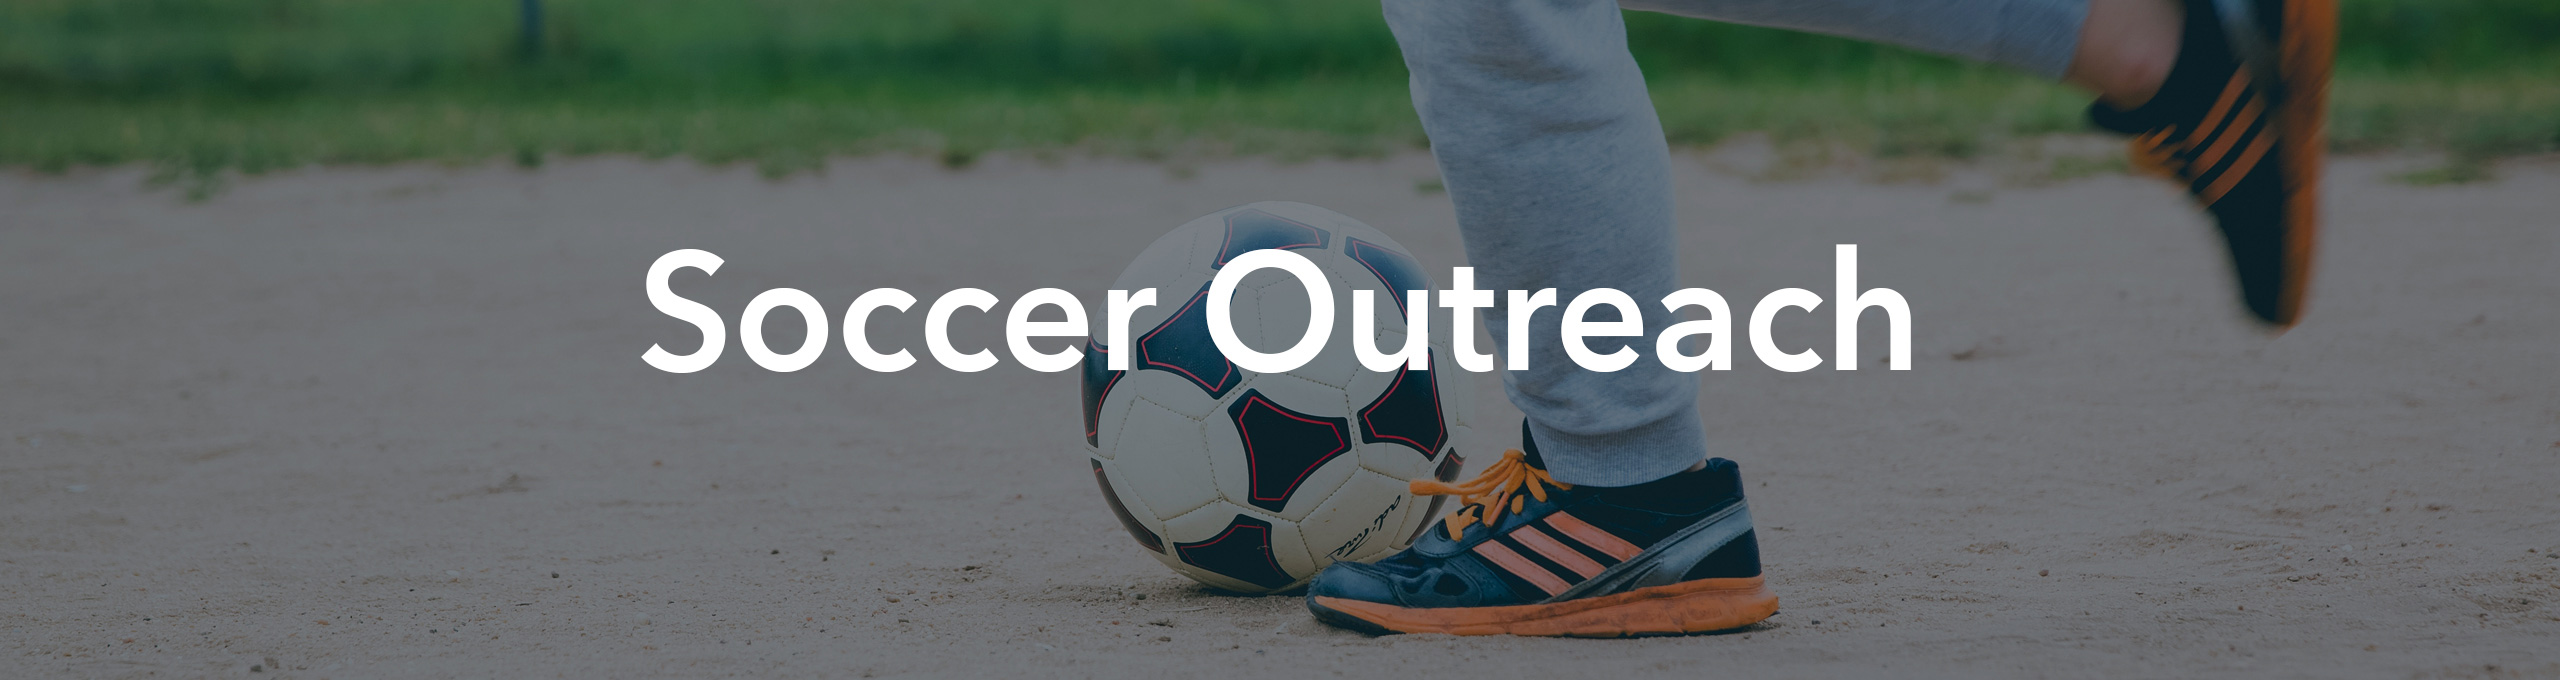 Soccer Outreach